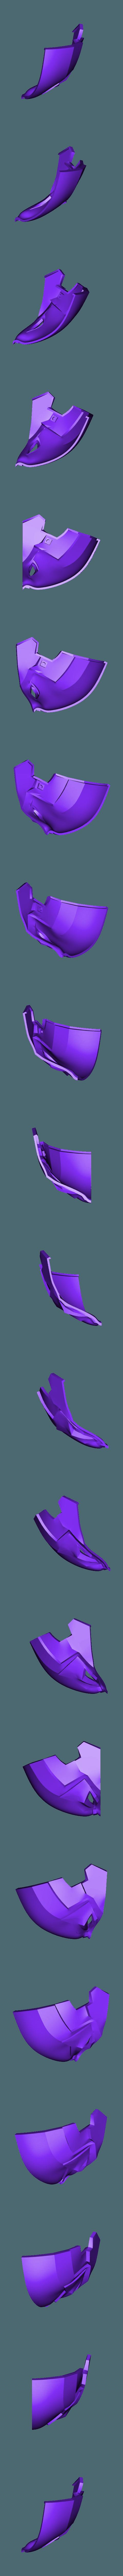 Deathstroke Part 2.stl Download STL file Deathstroke Injustice Helmet • 3D printable model, VillainousPropShop